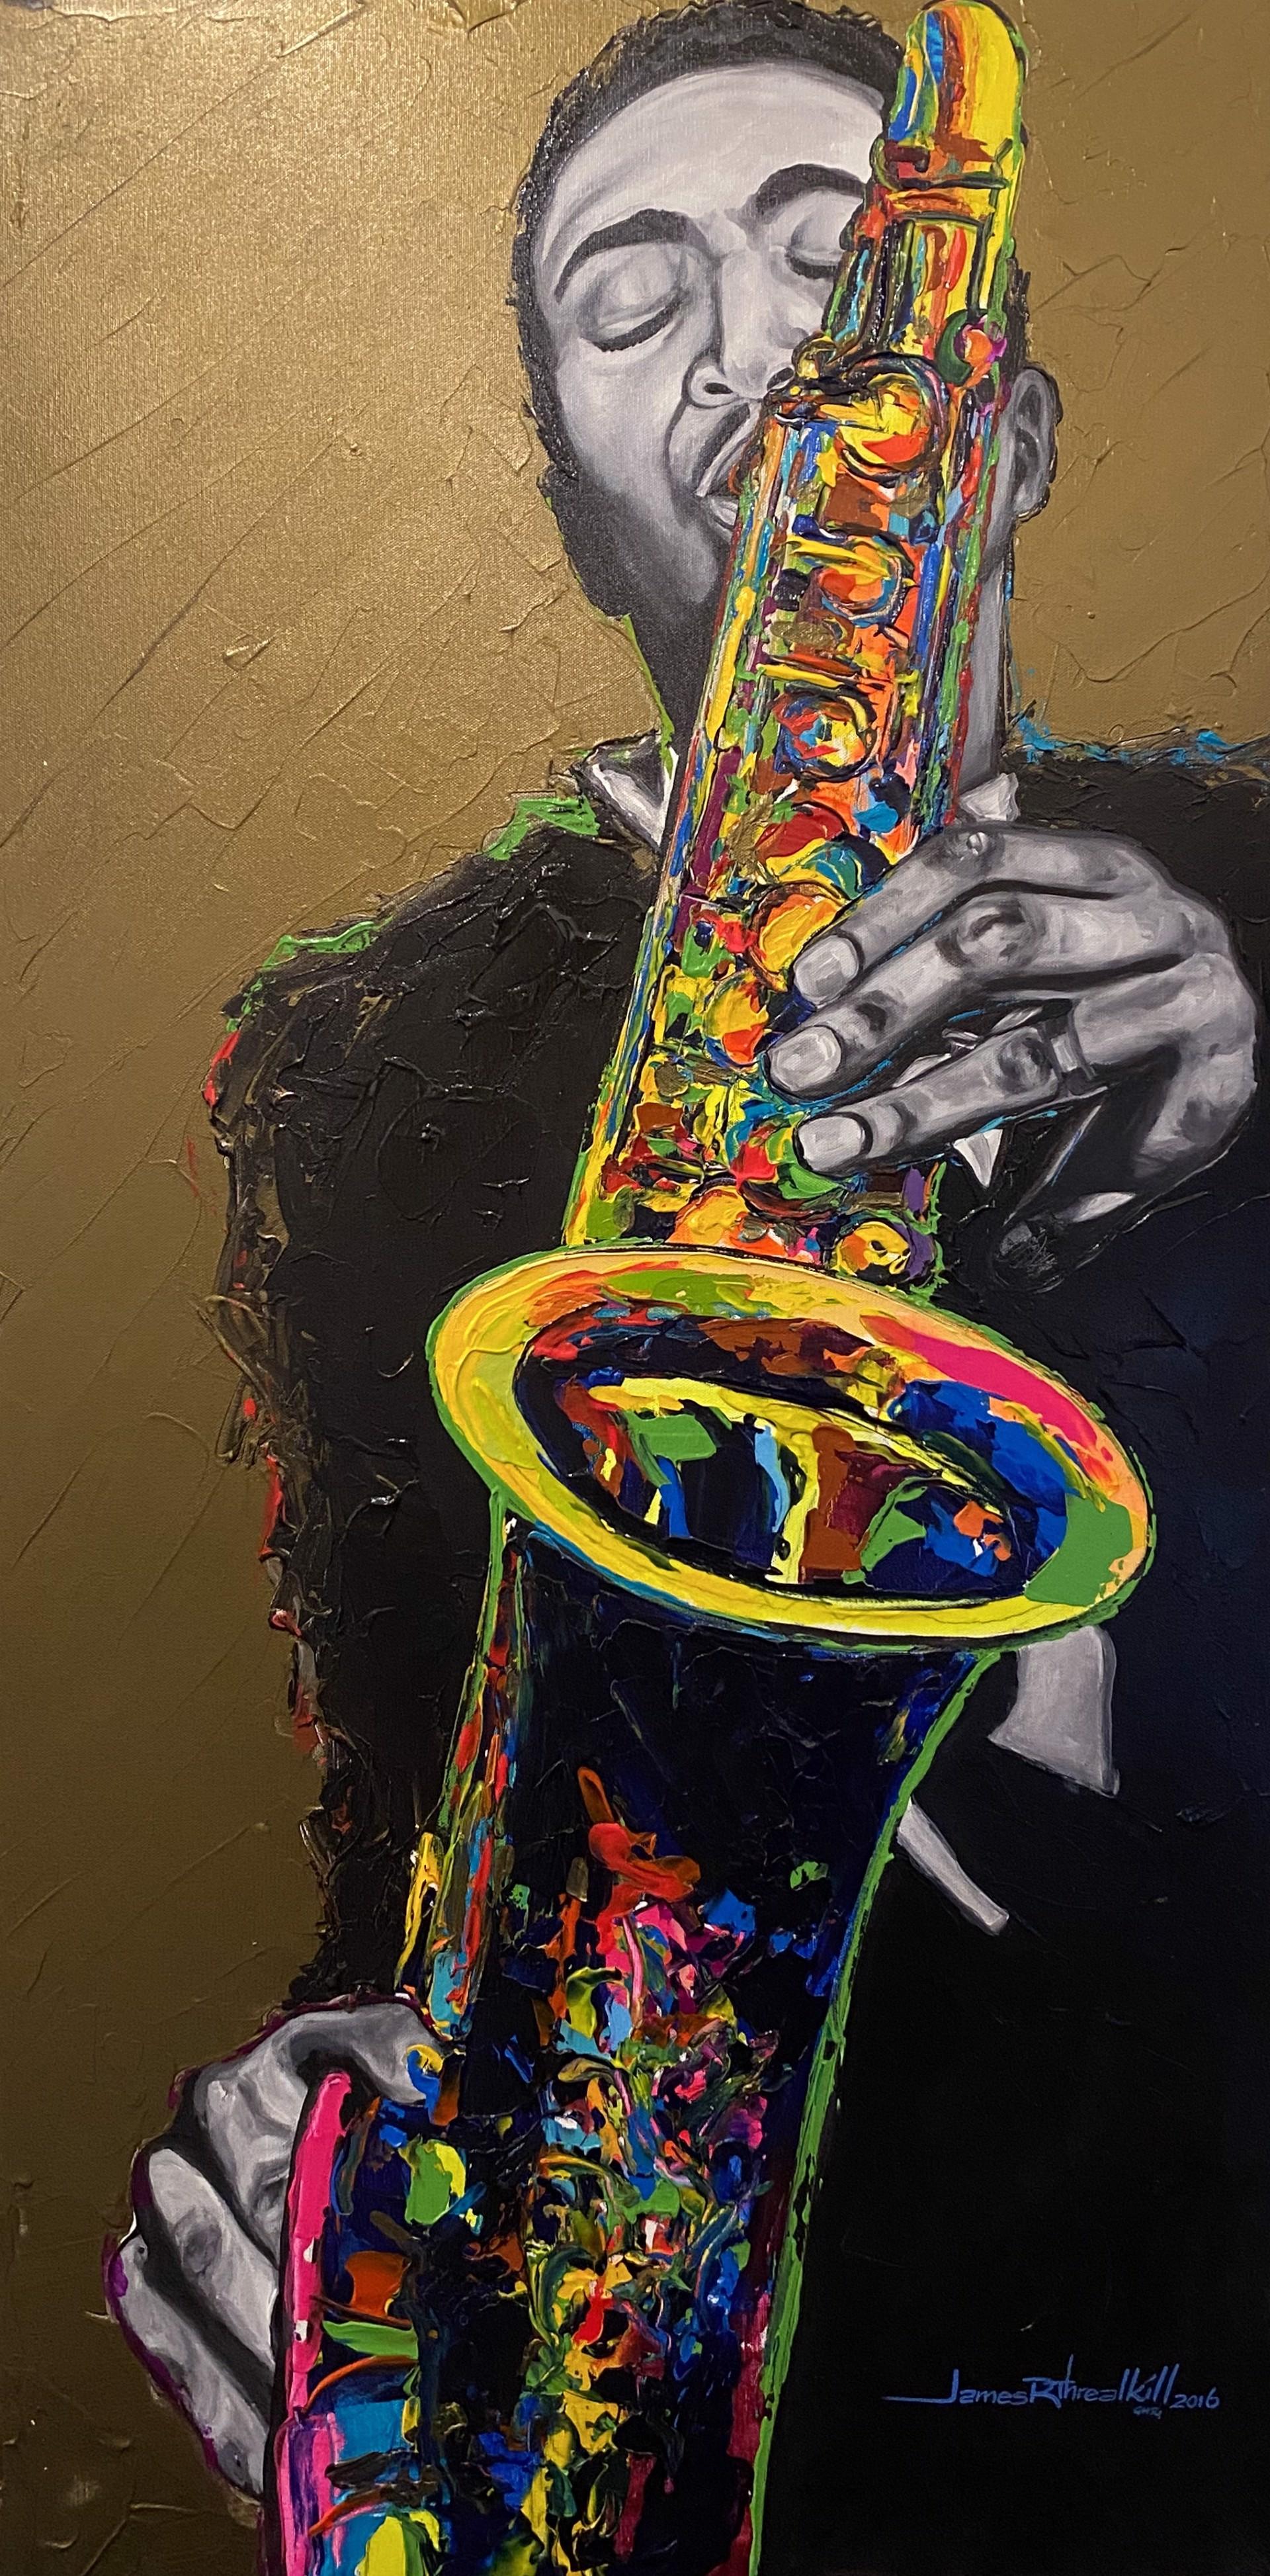 Electrified Jazz  by James Threalkill